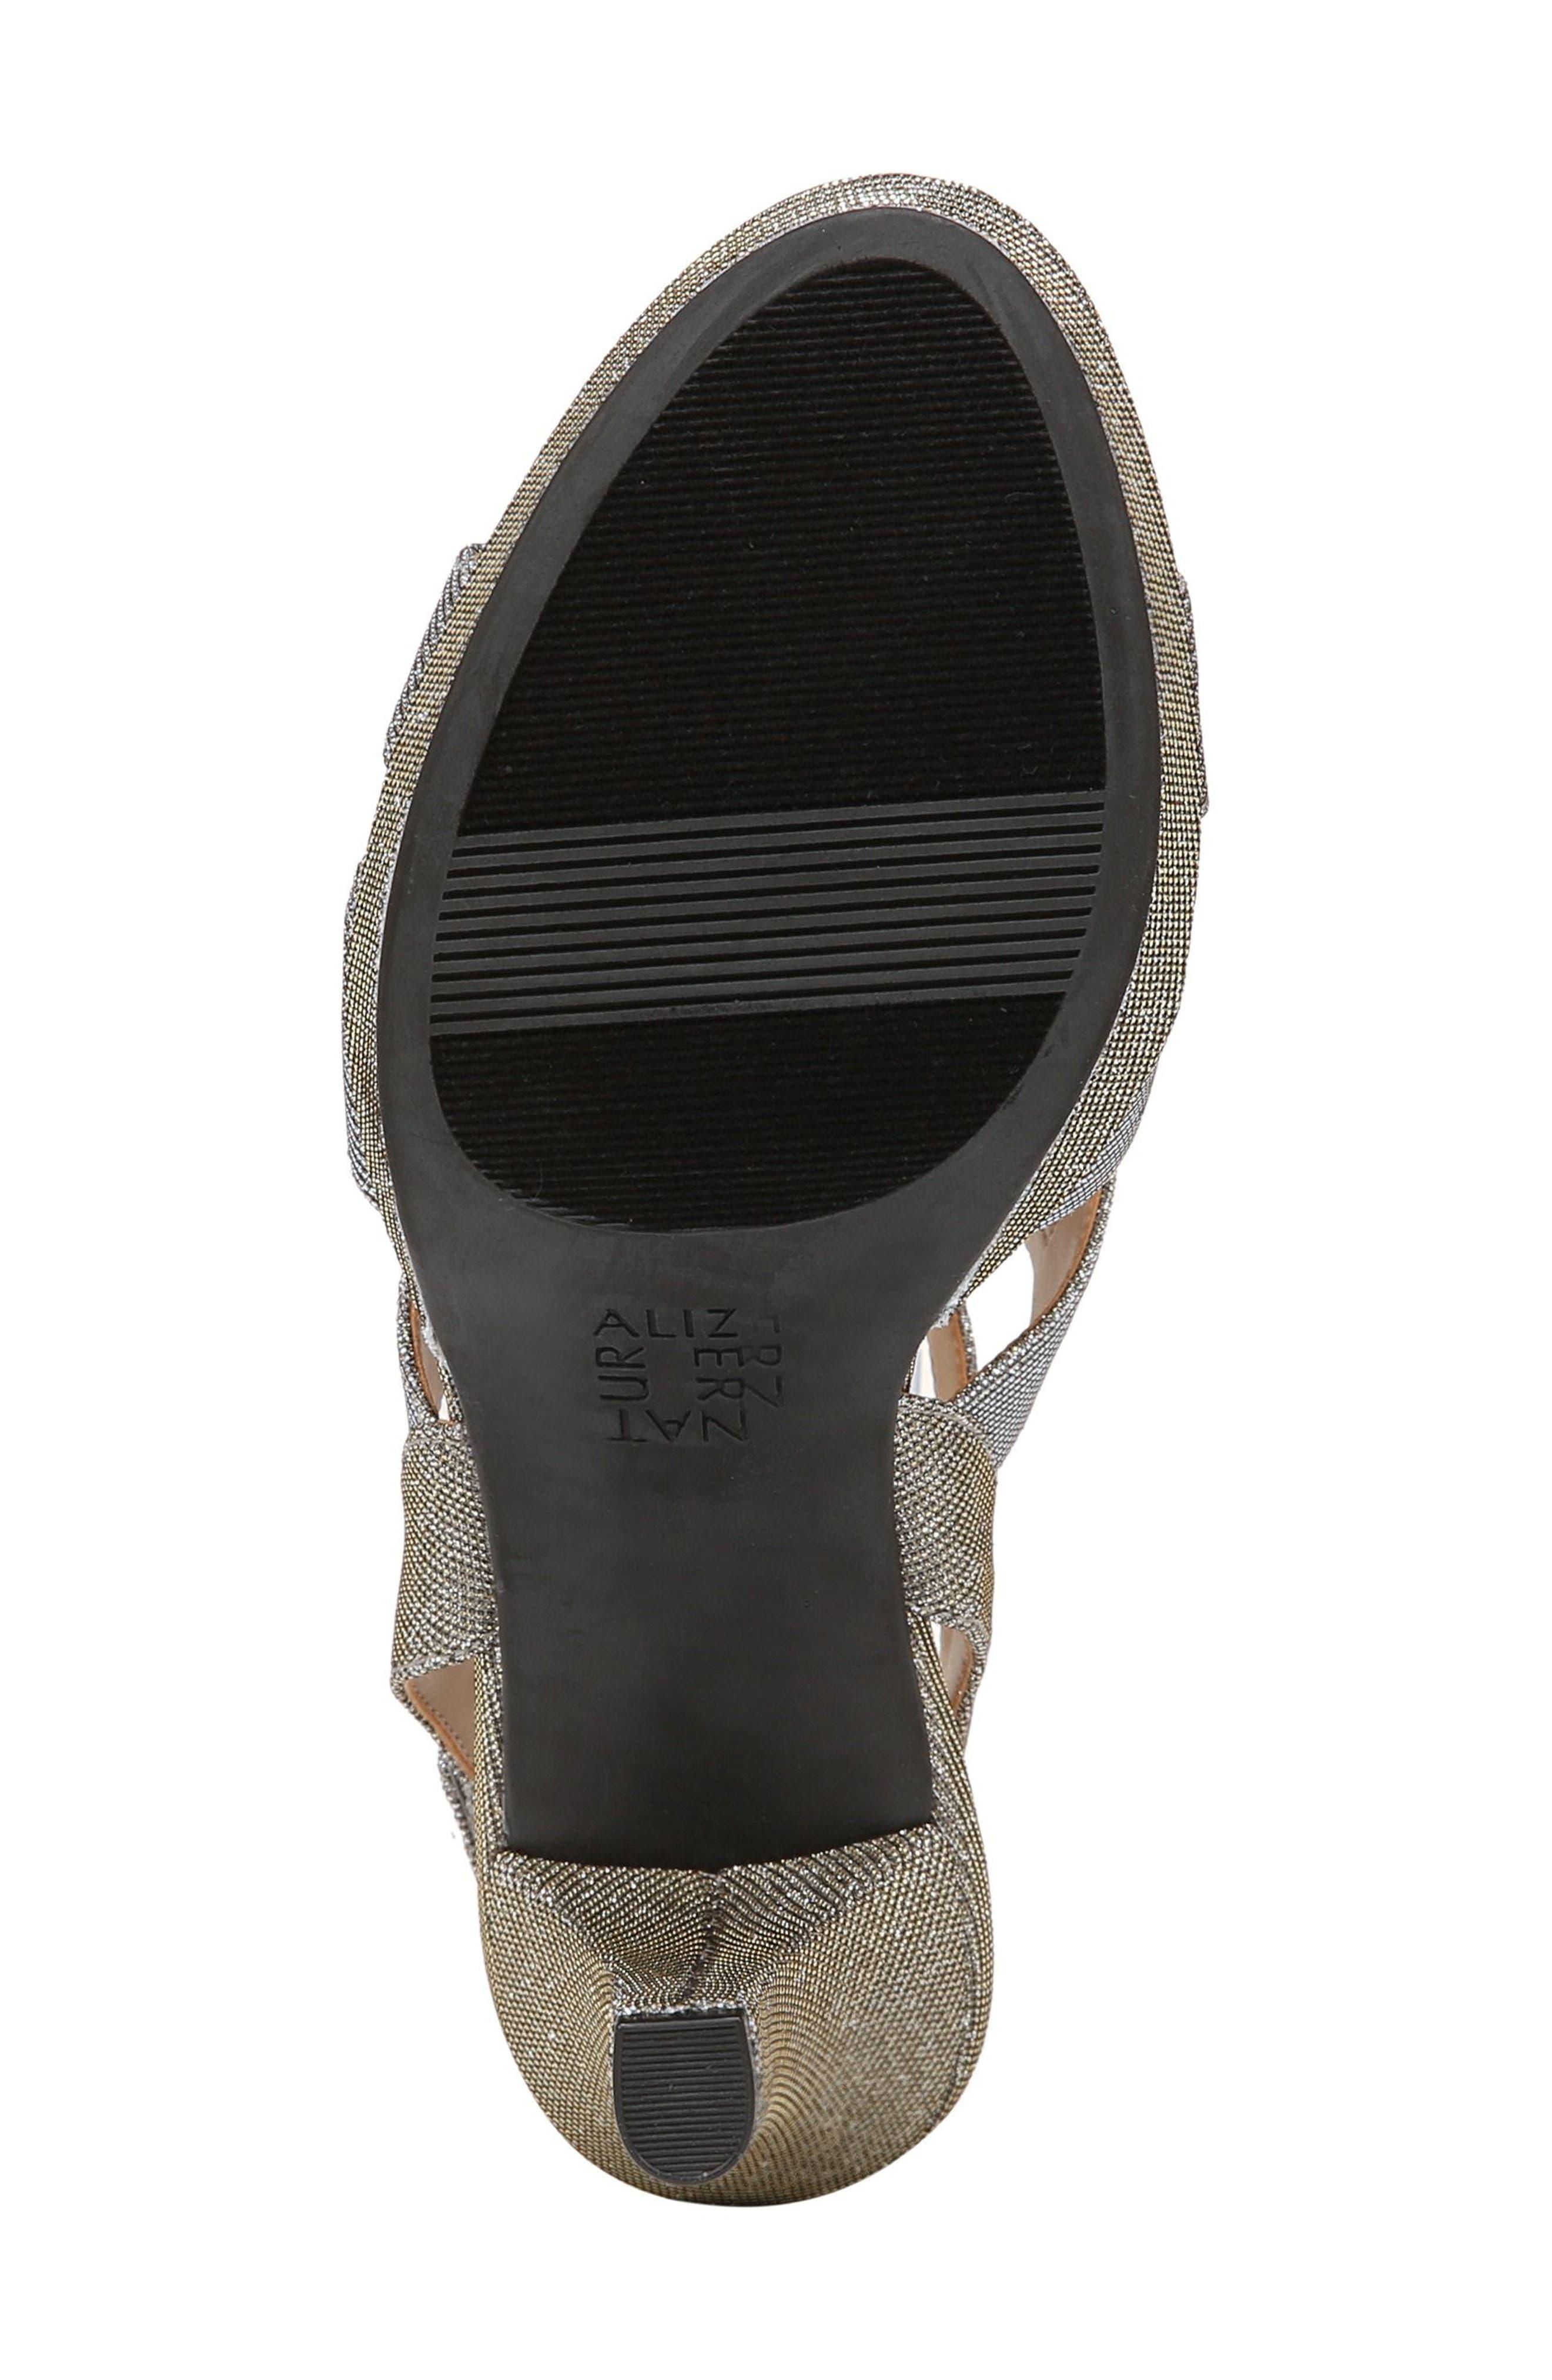 'Pressley' Slingback Platform Sandal,                             Alternate thumbnail 6, color,                             043